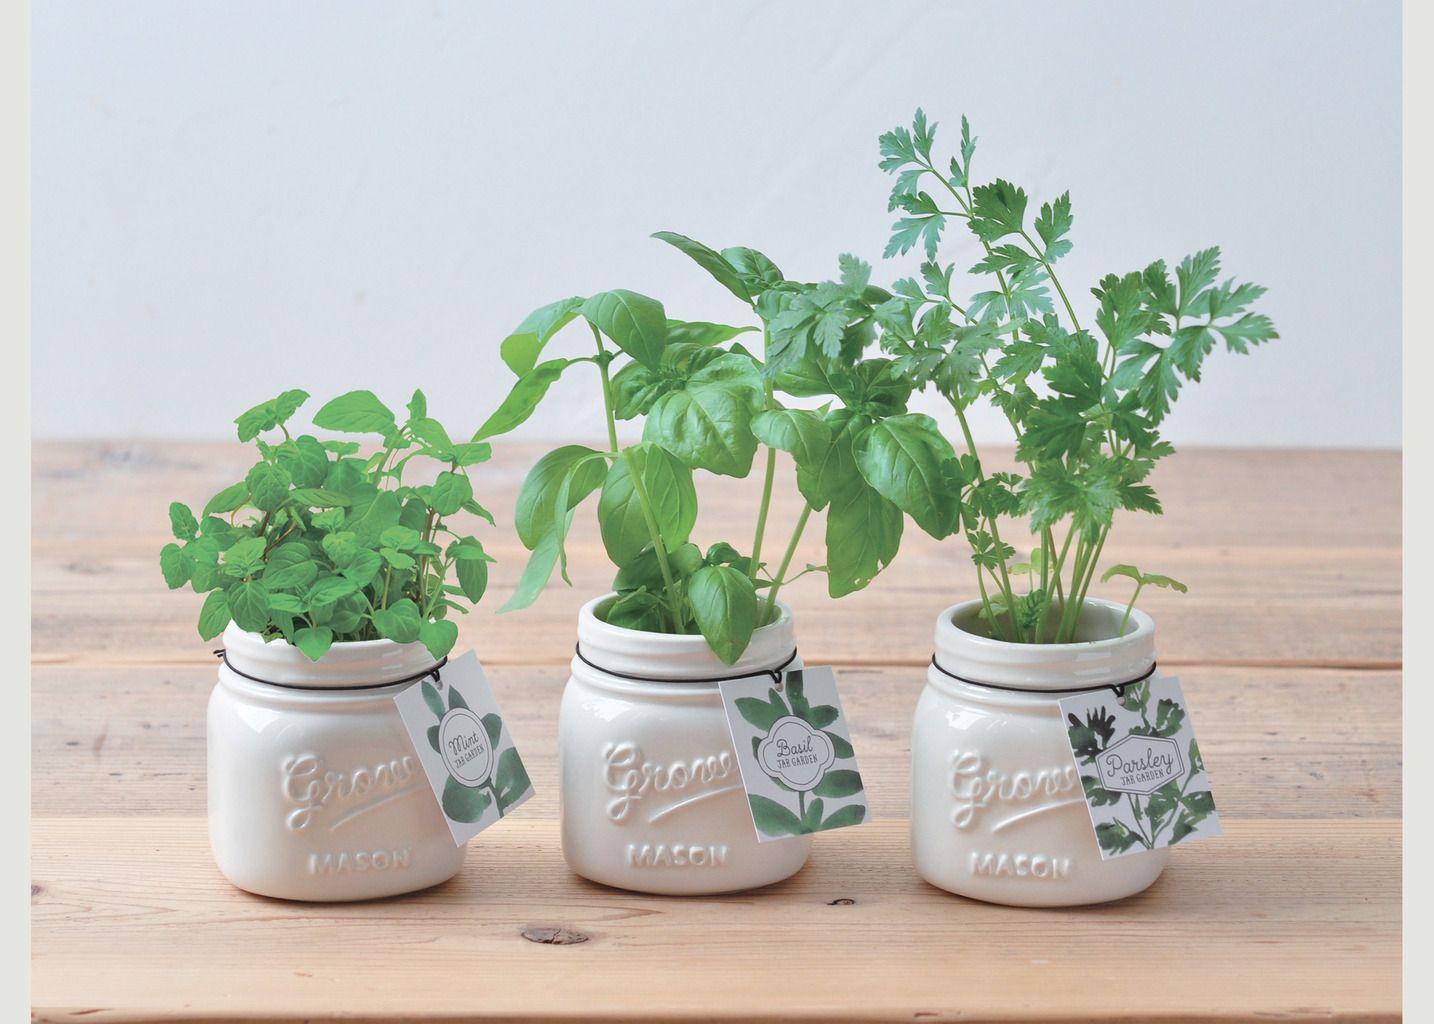 Jar Garden - Persil d'Italie - Noted